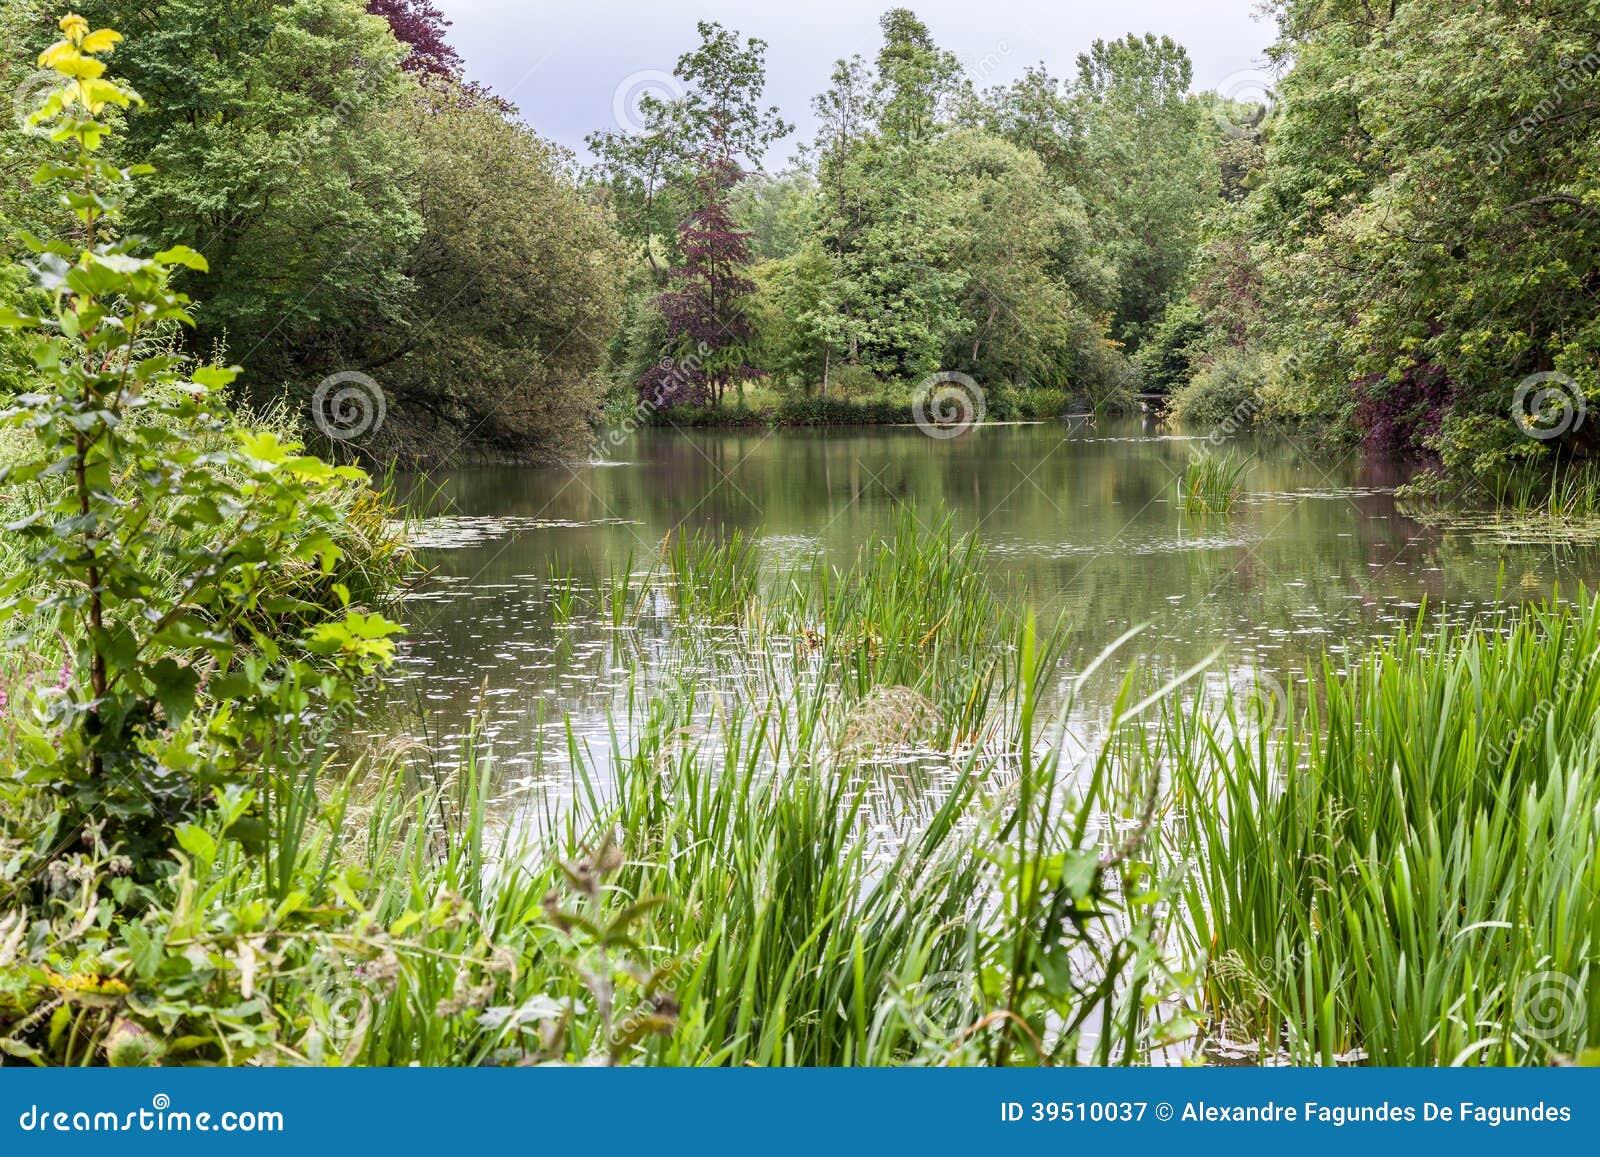 Blenheim Palace Gardens England